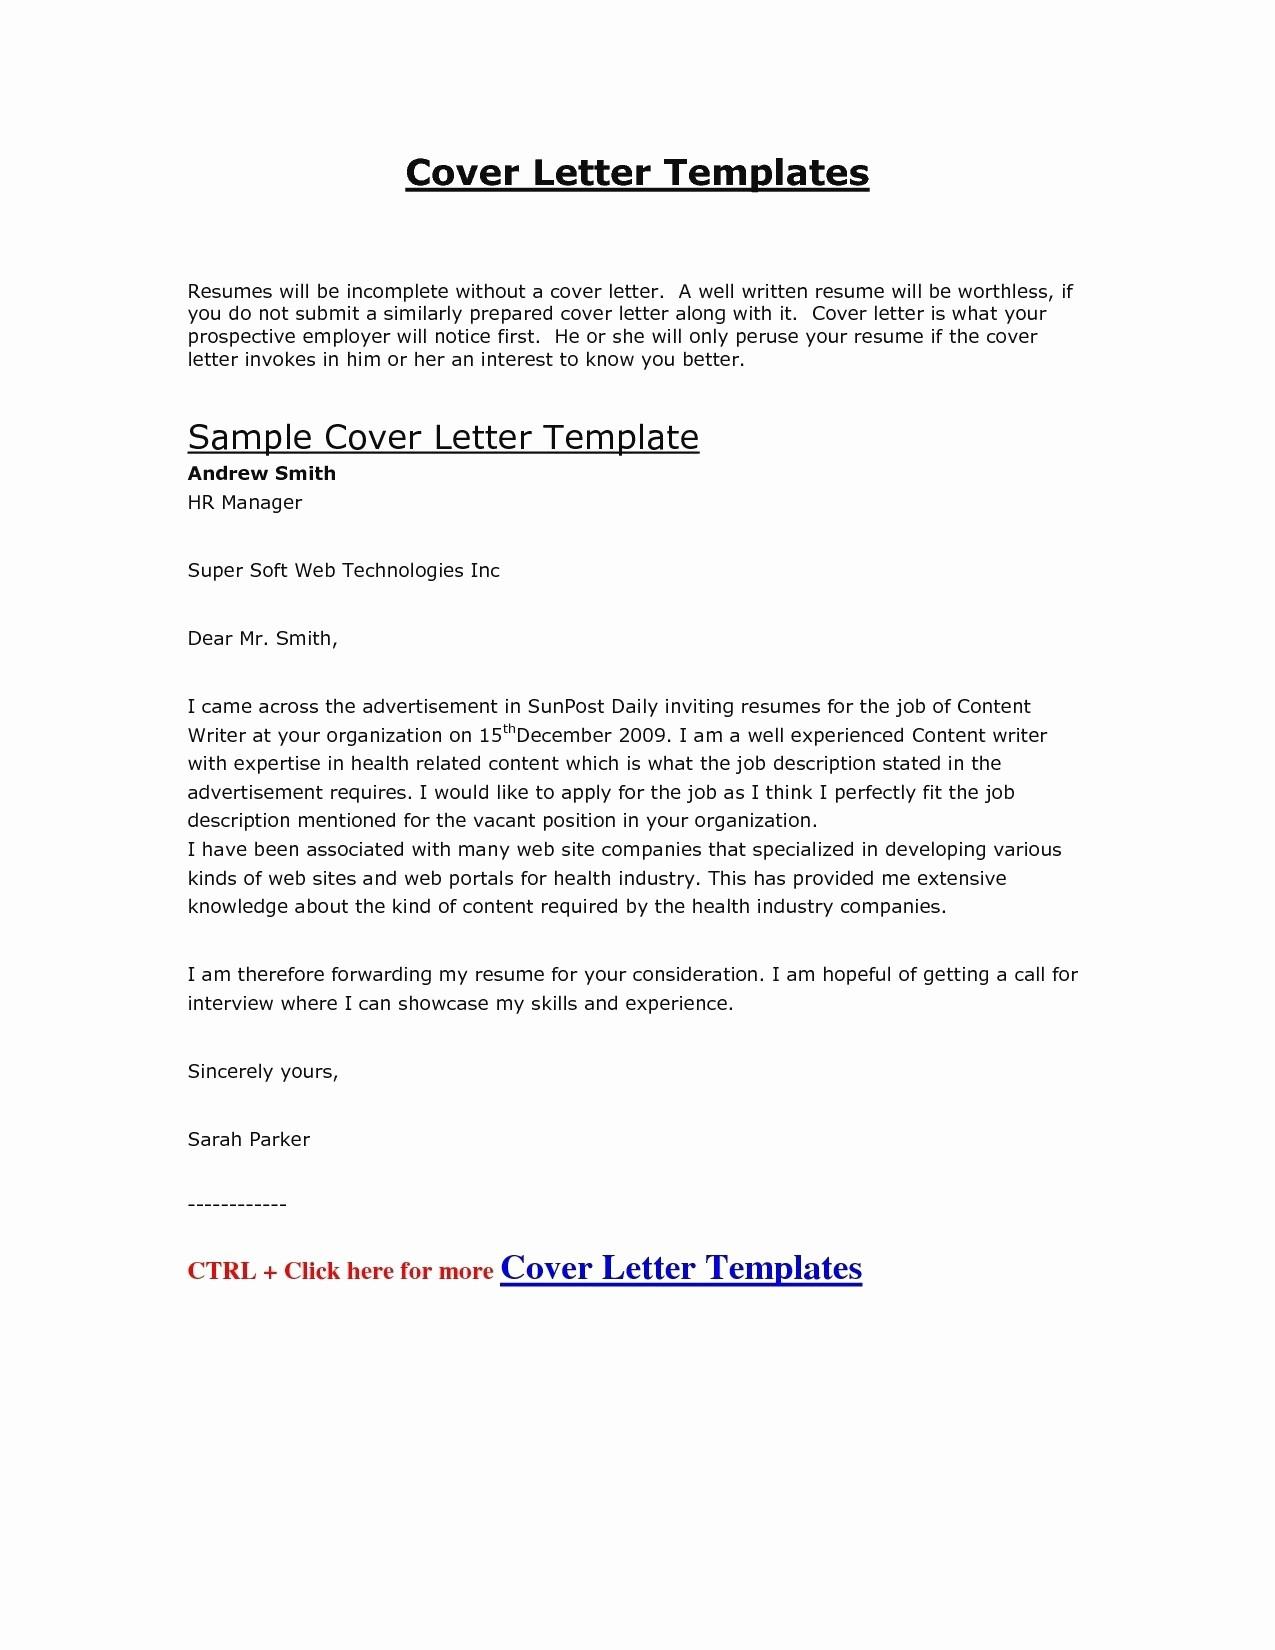 Basic Cover Letter Template - Job Application Letter format Template Copy Cover Letter Template Hr